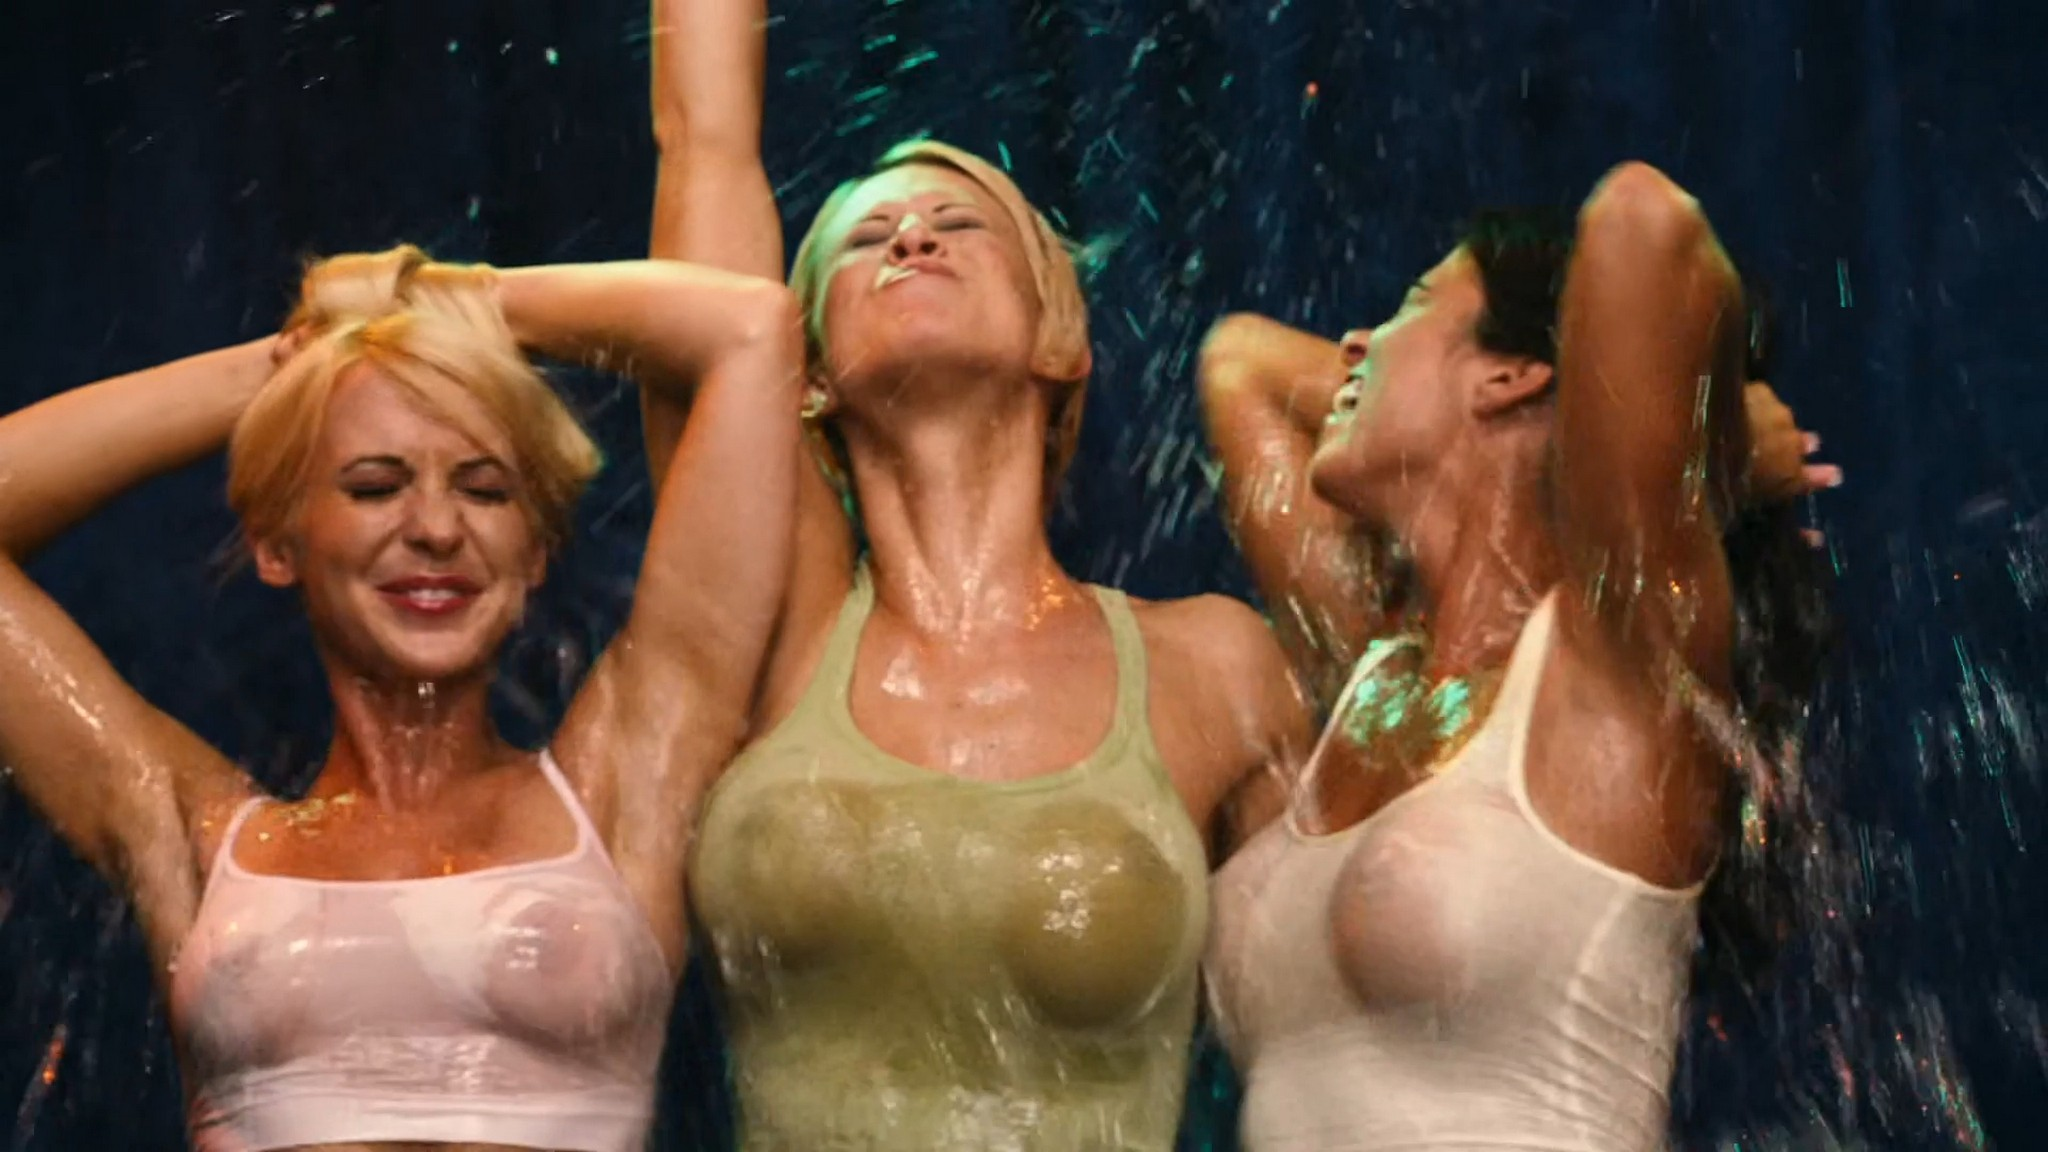 Danneel Ackles nude Carmen Electra, Arielle Kebbel, sexy otherrs nude and hot - Mardi Gras: Spring Break (2011) HD 1080p WEb (18)